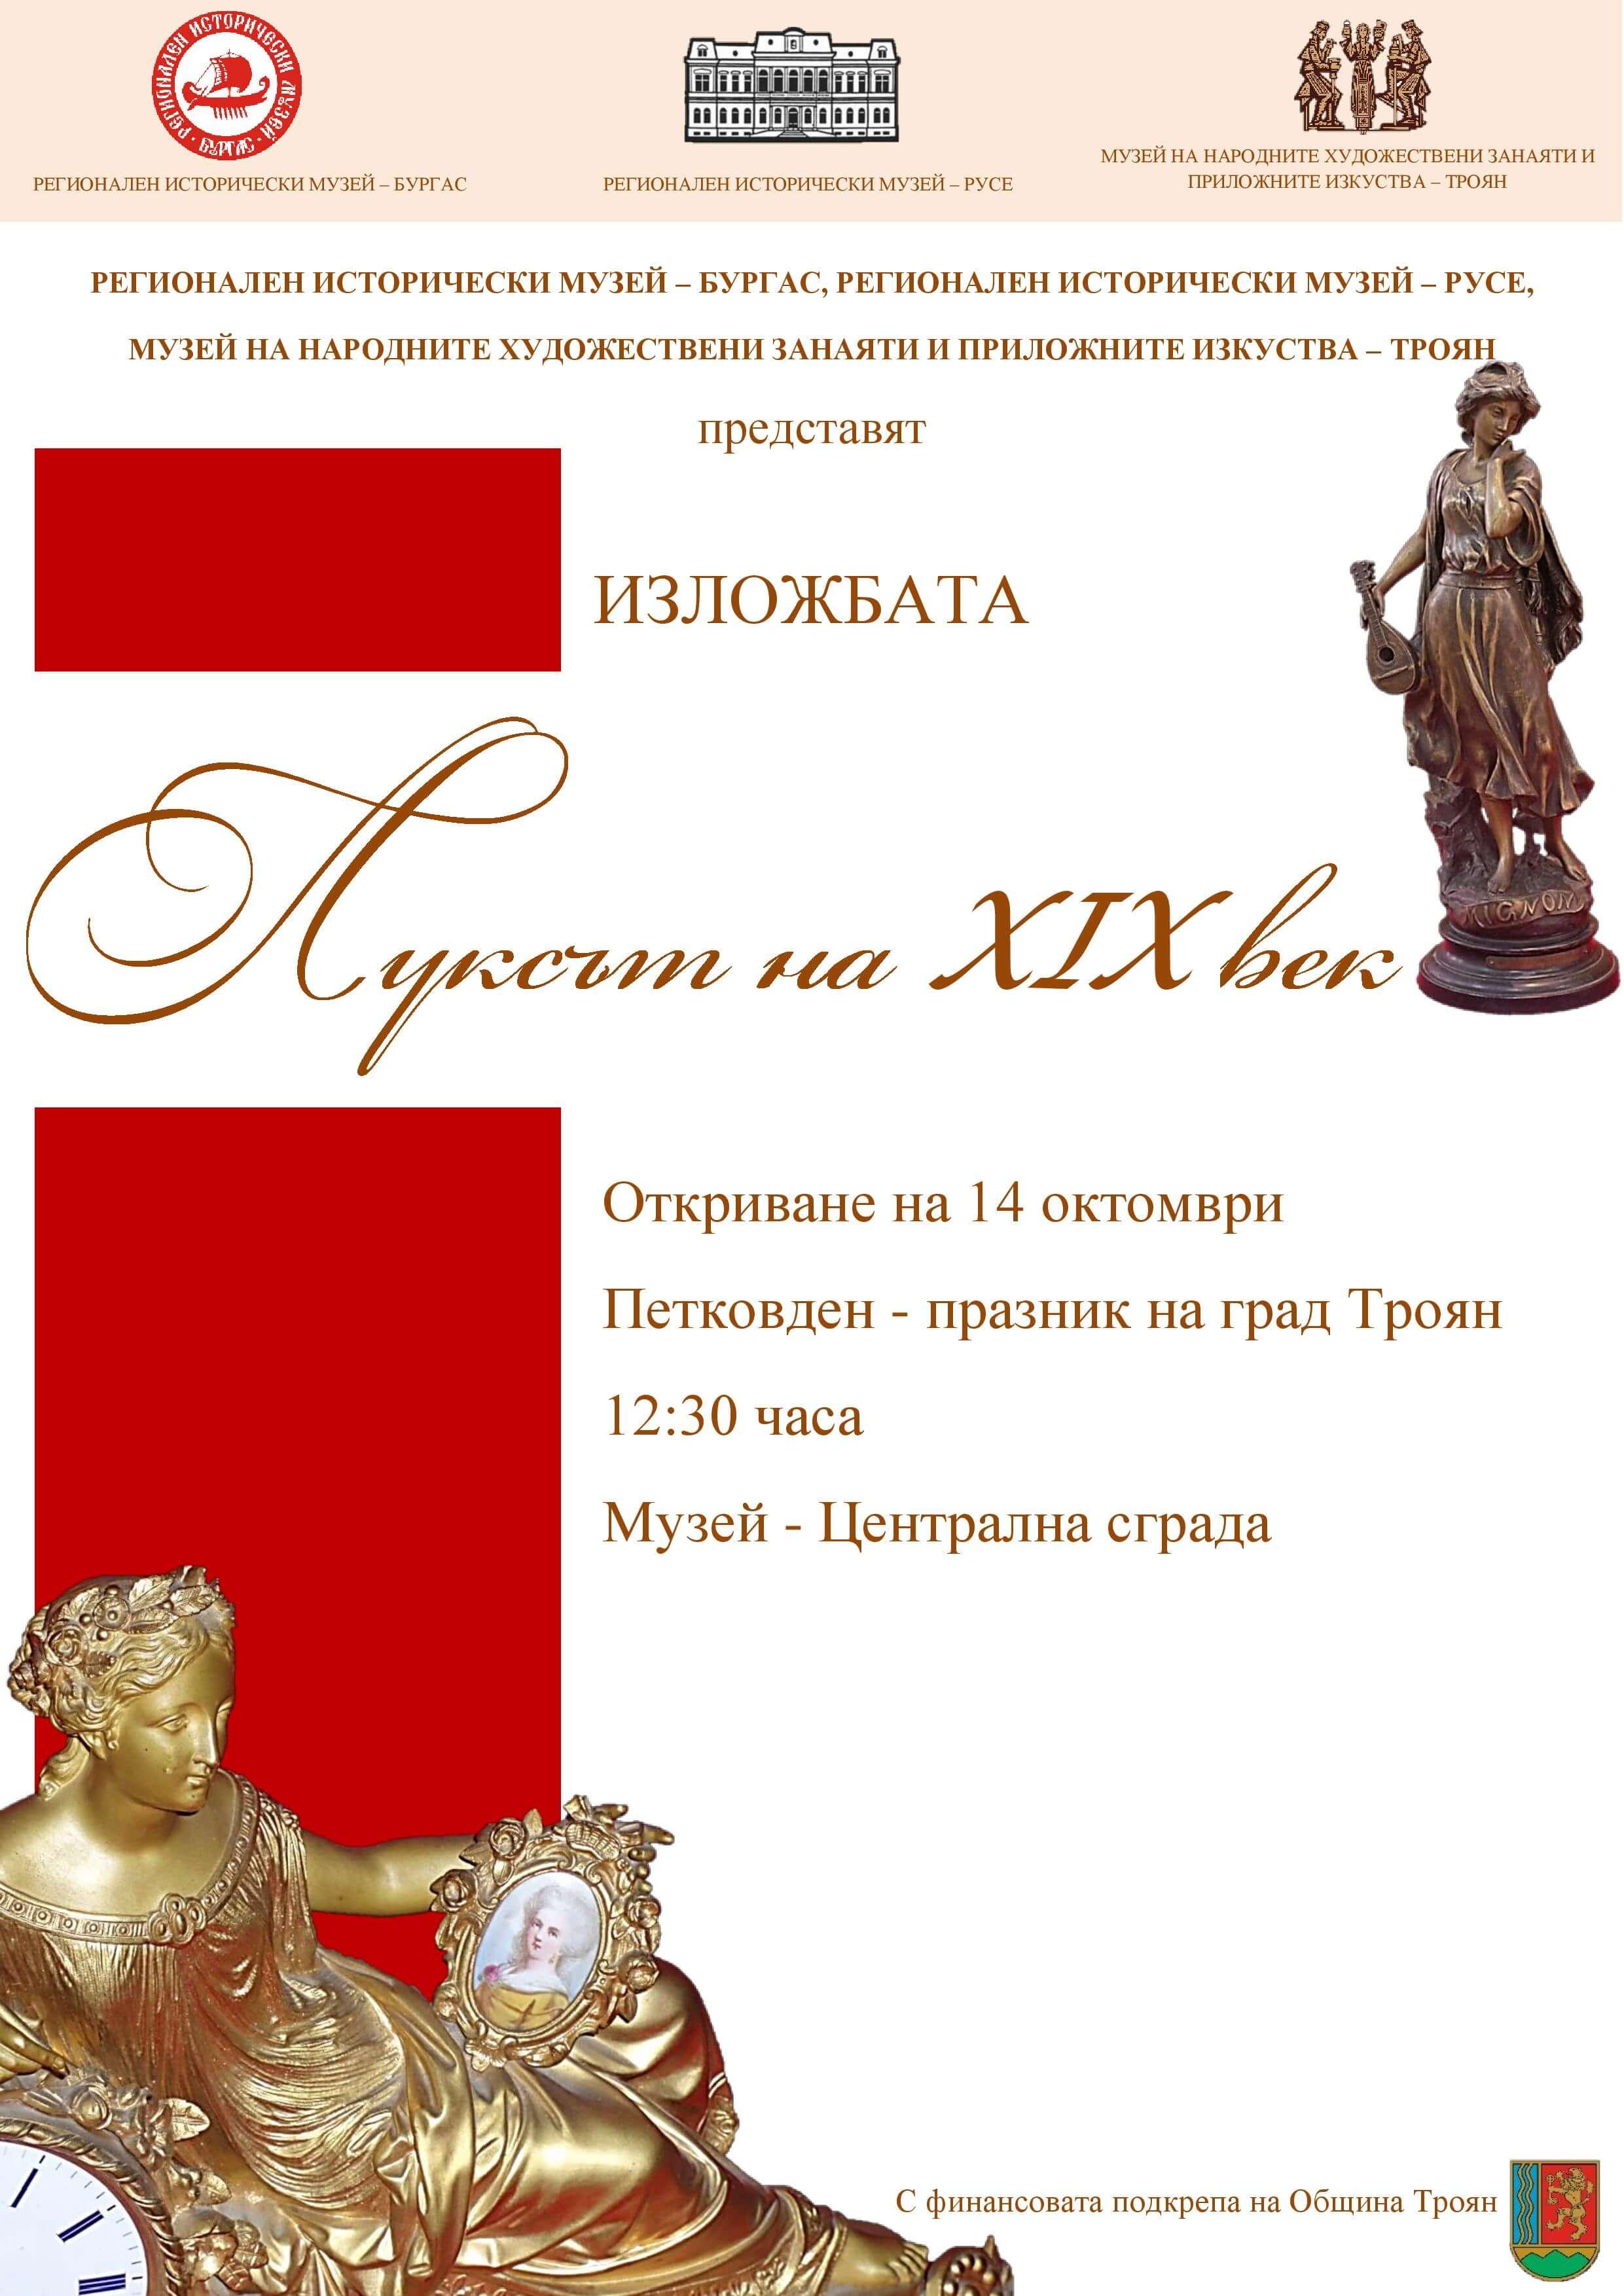 troyan-museum-luksat-na-devetnaysti-vek